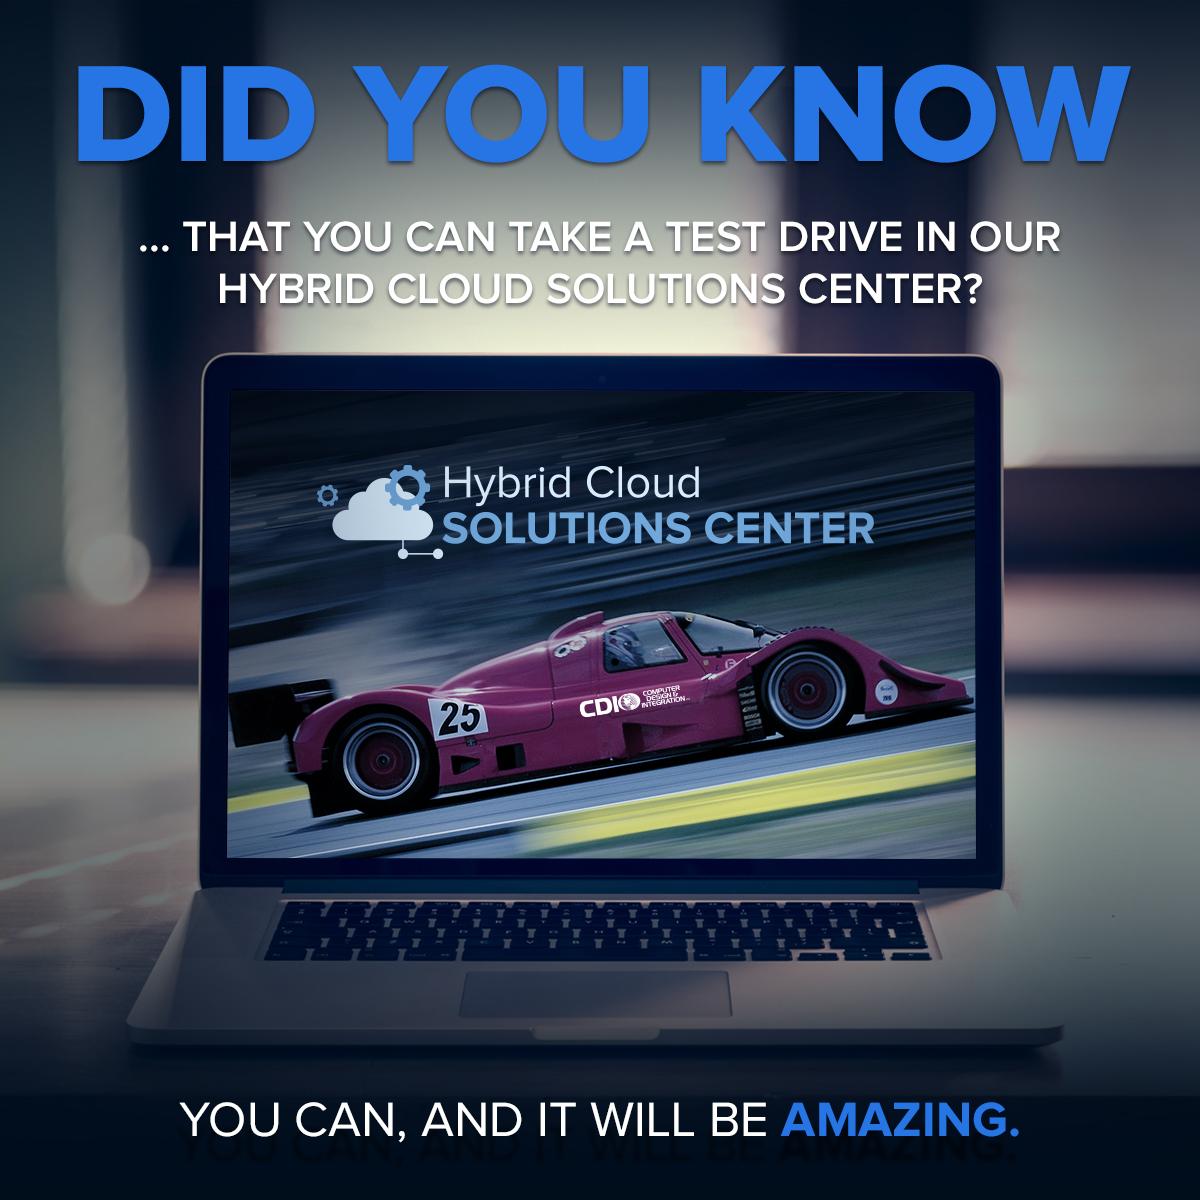 Hybrid Cloud Solutions Center